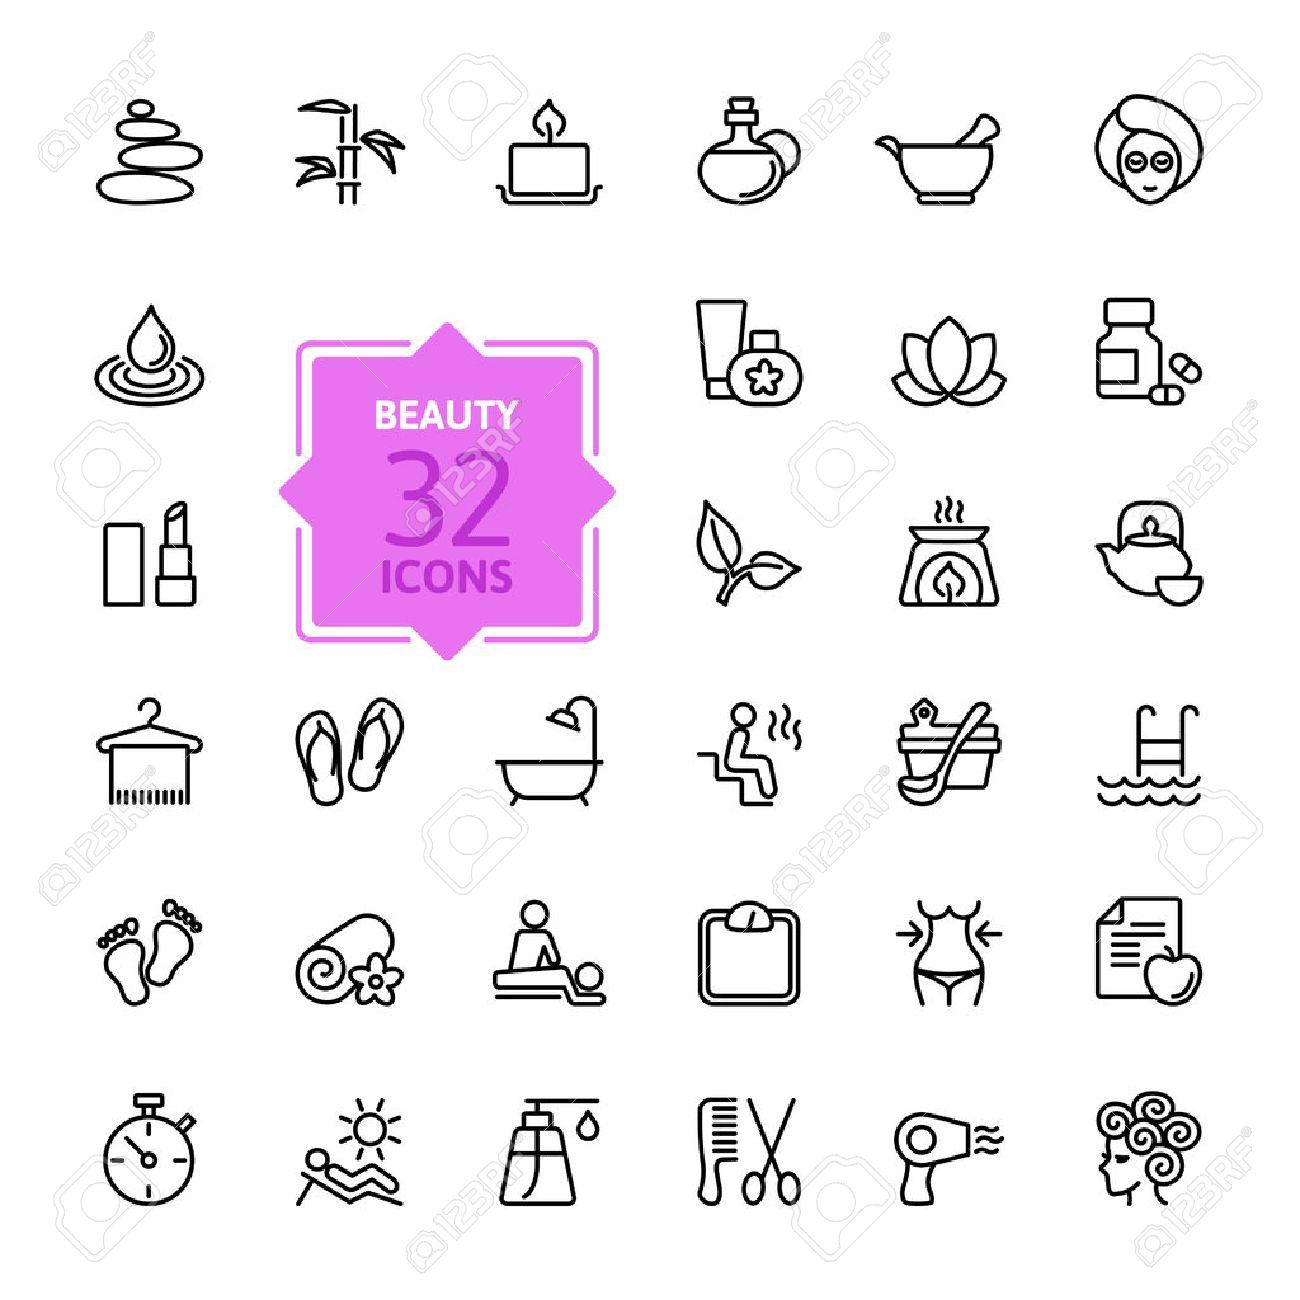 Outline web icon set - Spa & Beauty Stock Vector - 39328590